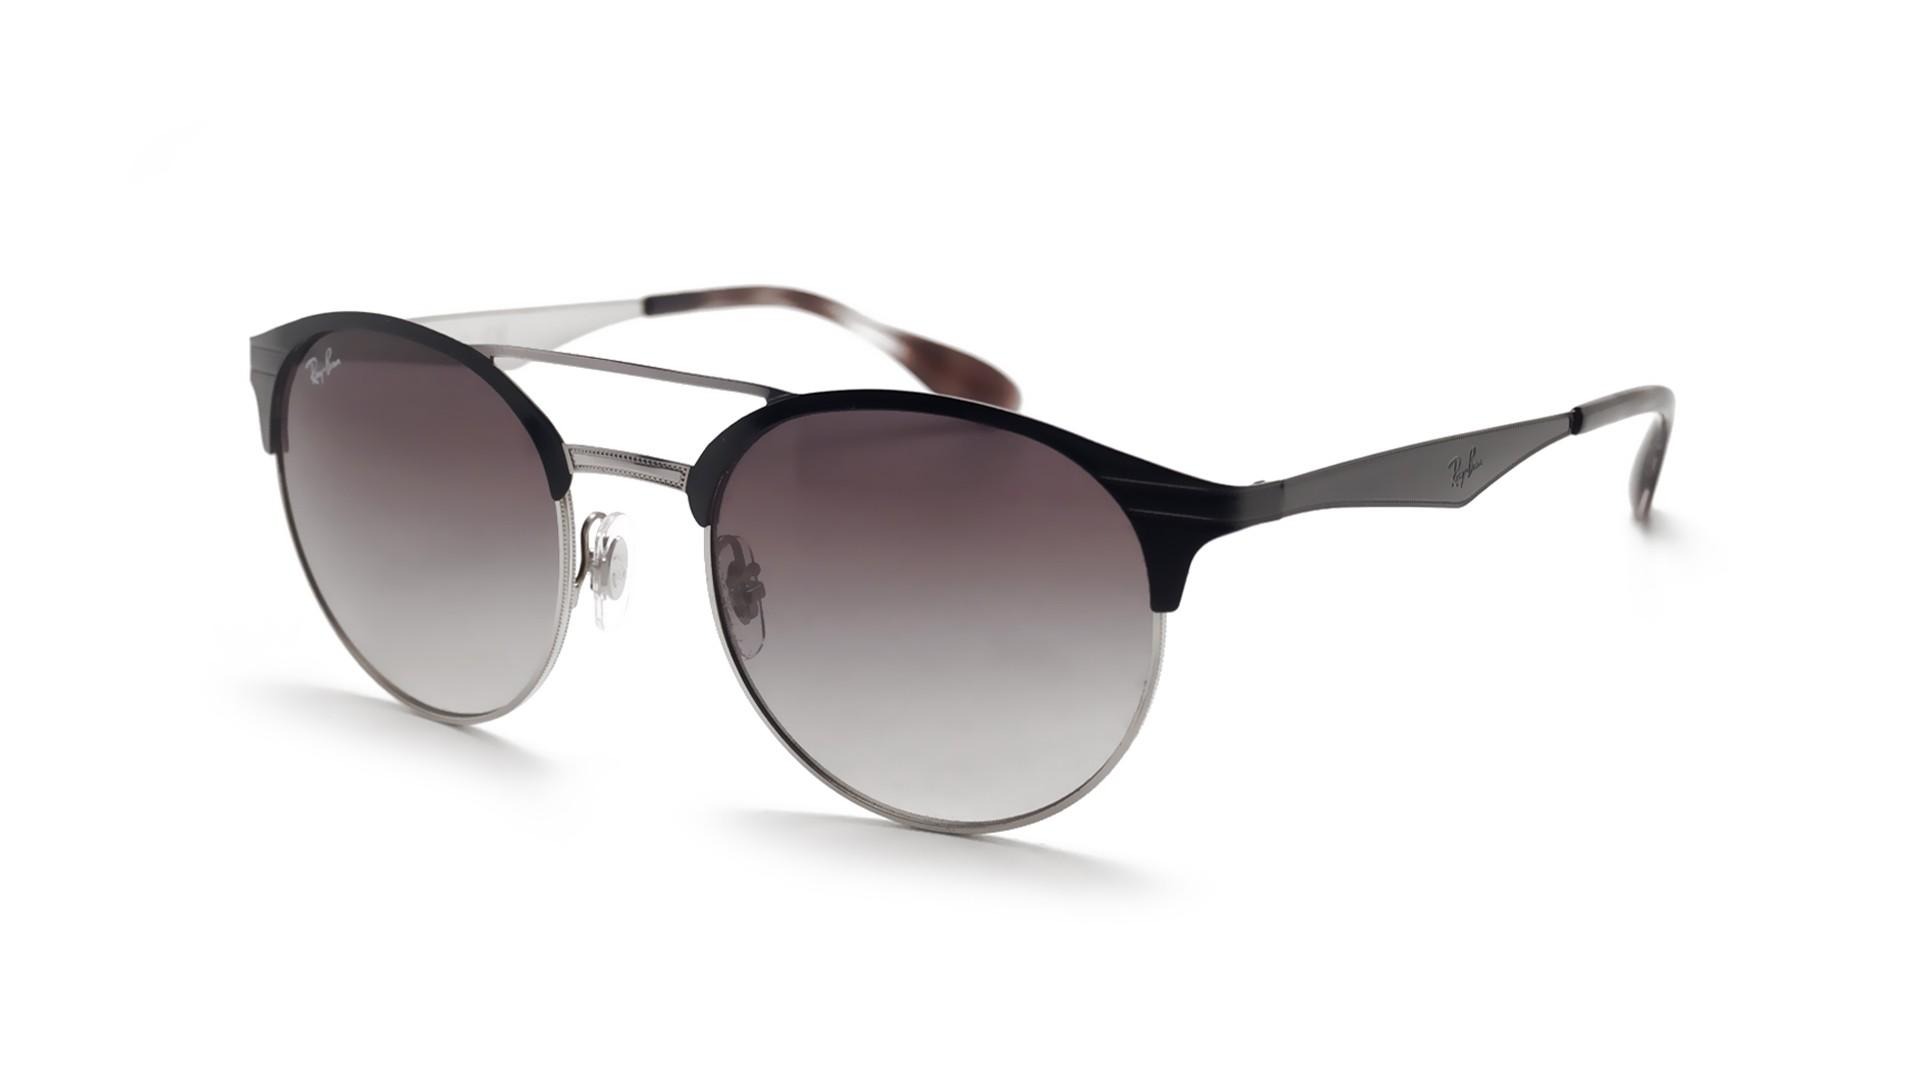 664b6e10946 Sunglasses Ray-Ban RB3545 9004 11 51-20 Black Medium Gradient